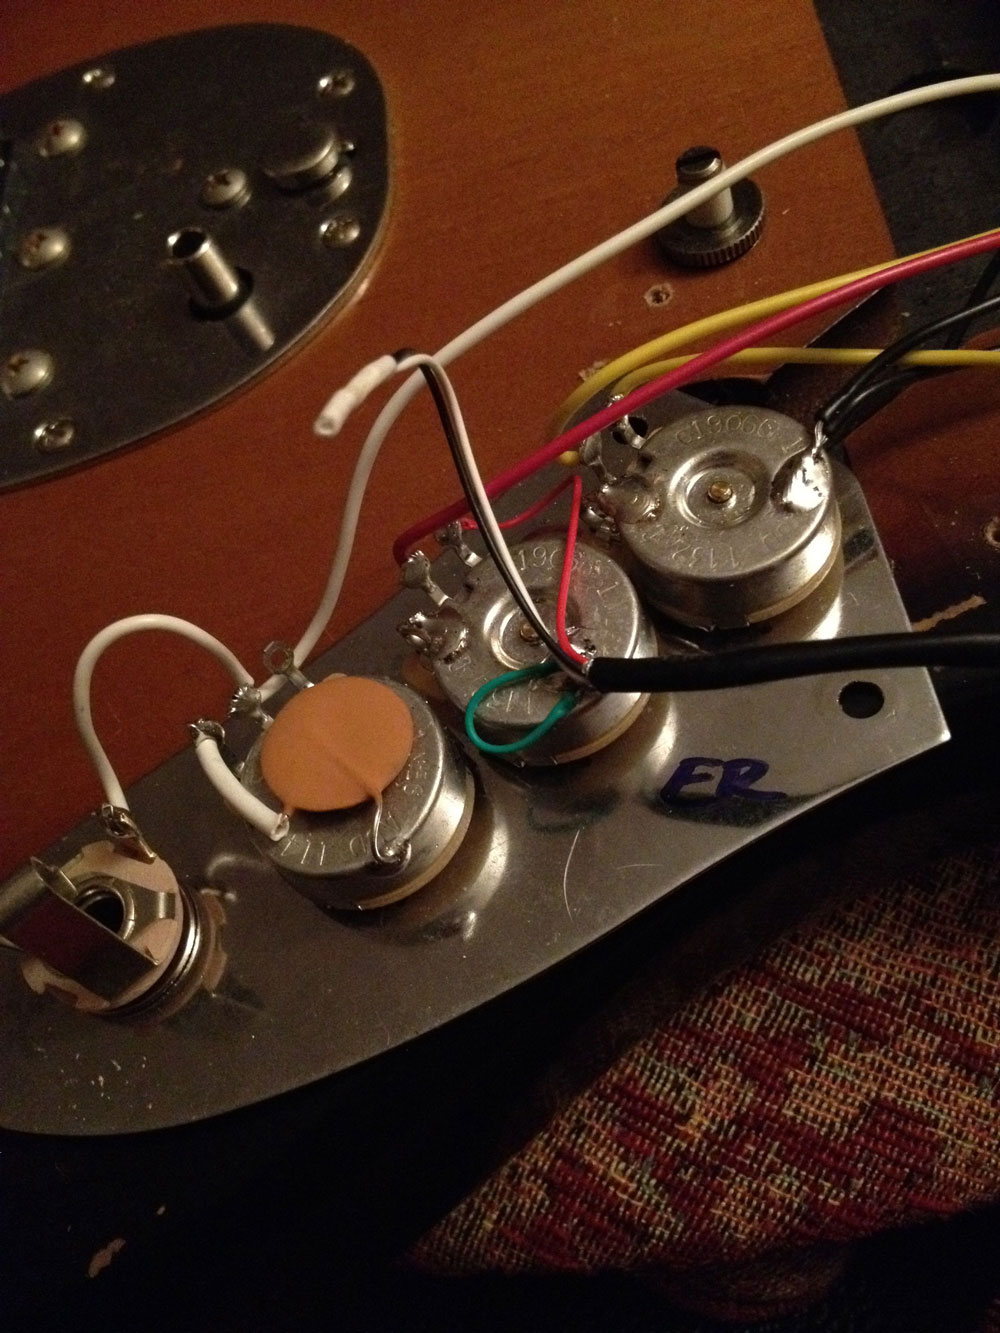 Kurt Cobain Jaguar Wiring Diagram - Wiring Diagram Perform free-choice -  free-choice.bovaribernesiclub.it [ 1333 x 1000 Pixel ]